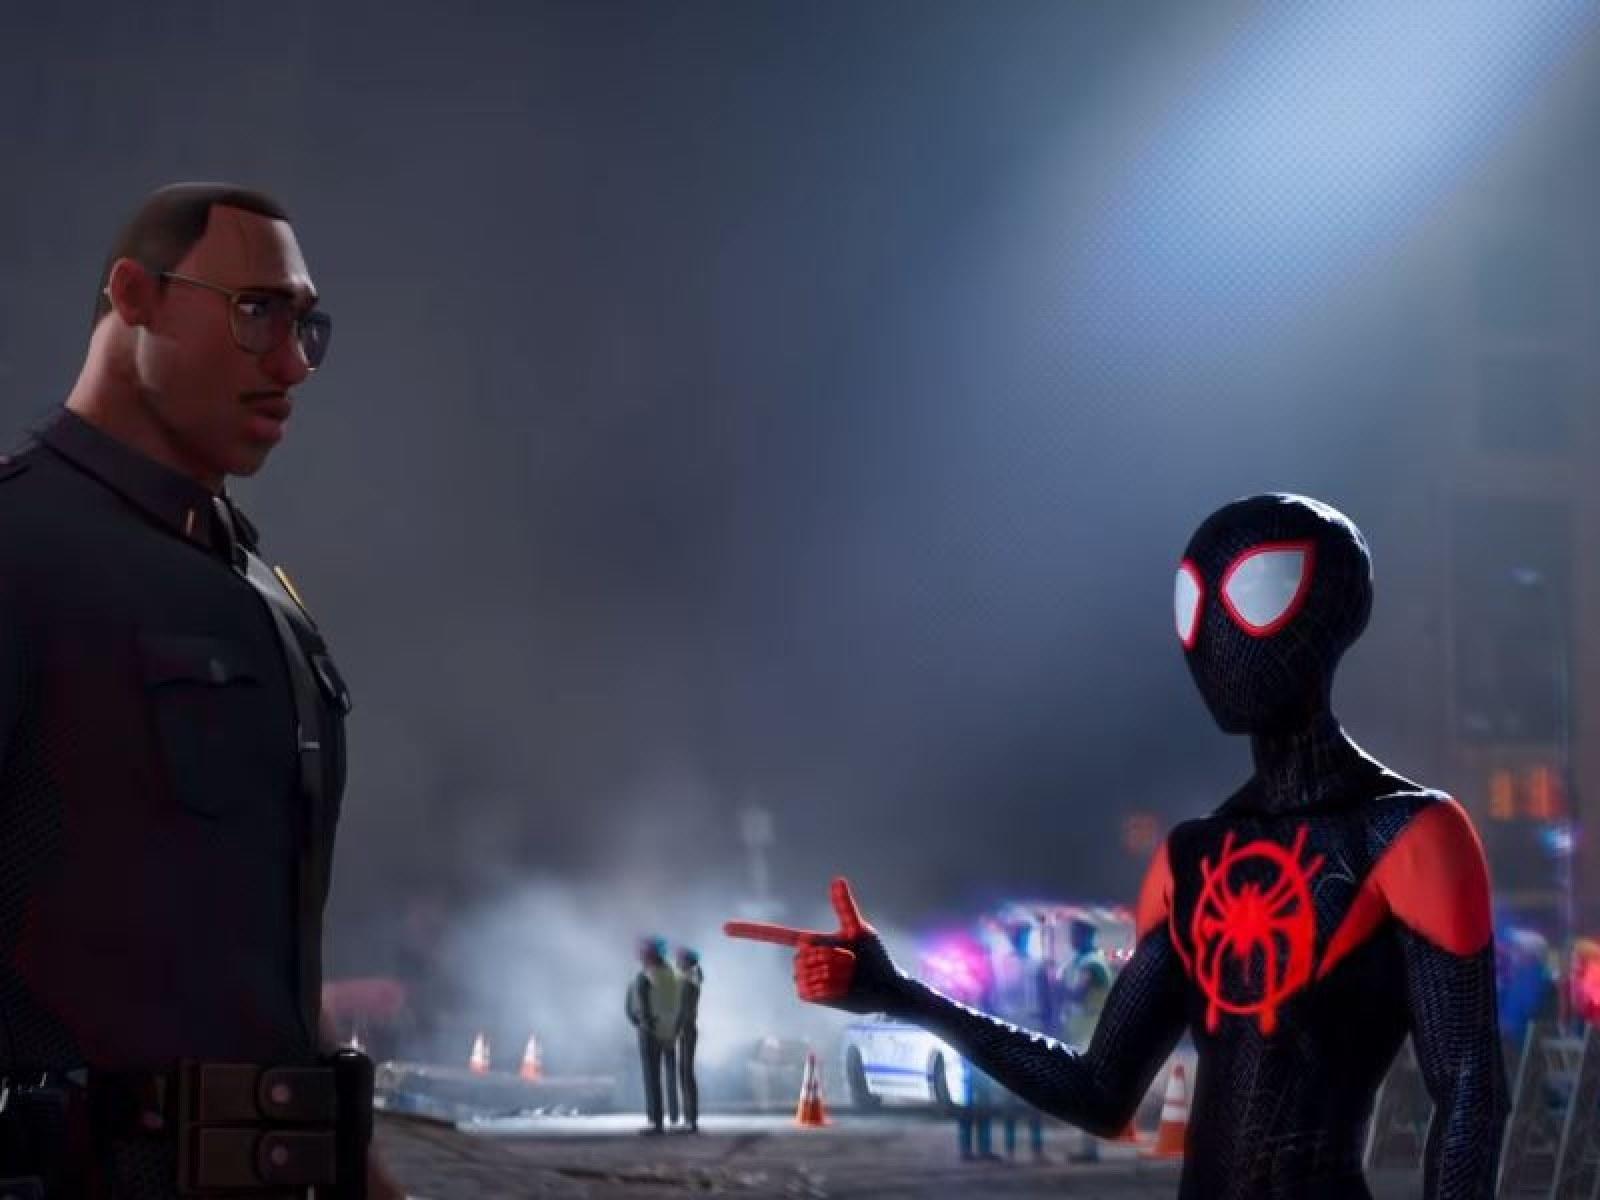 Spider-Man: Into the Spider-verse' Sequel, Spin-Off Already